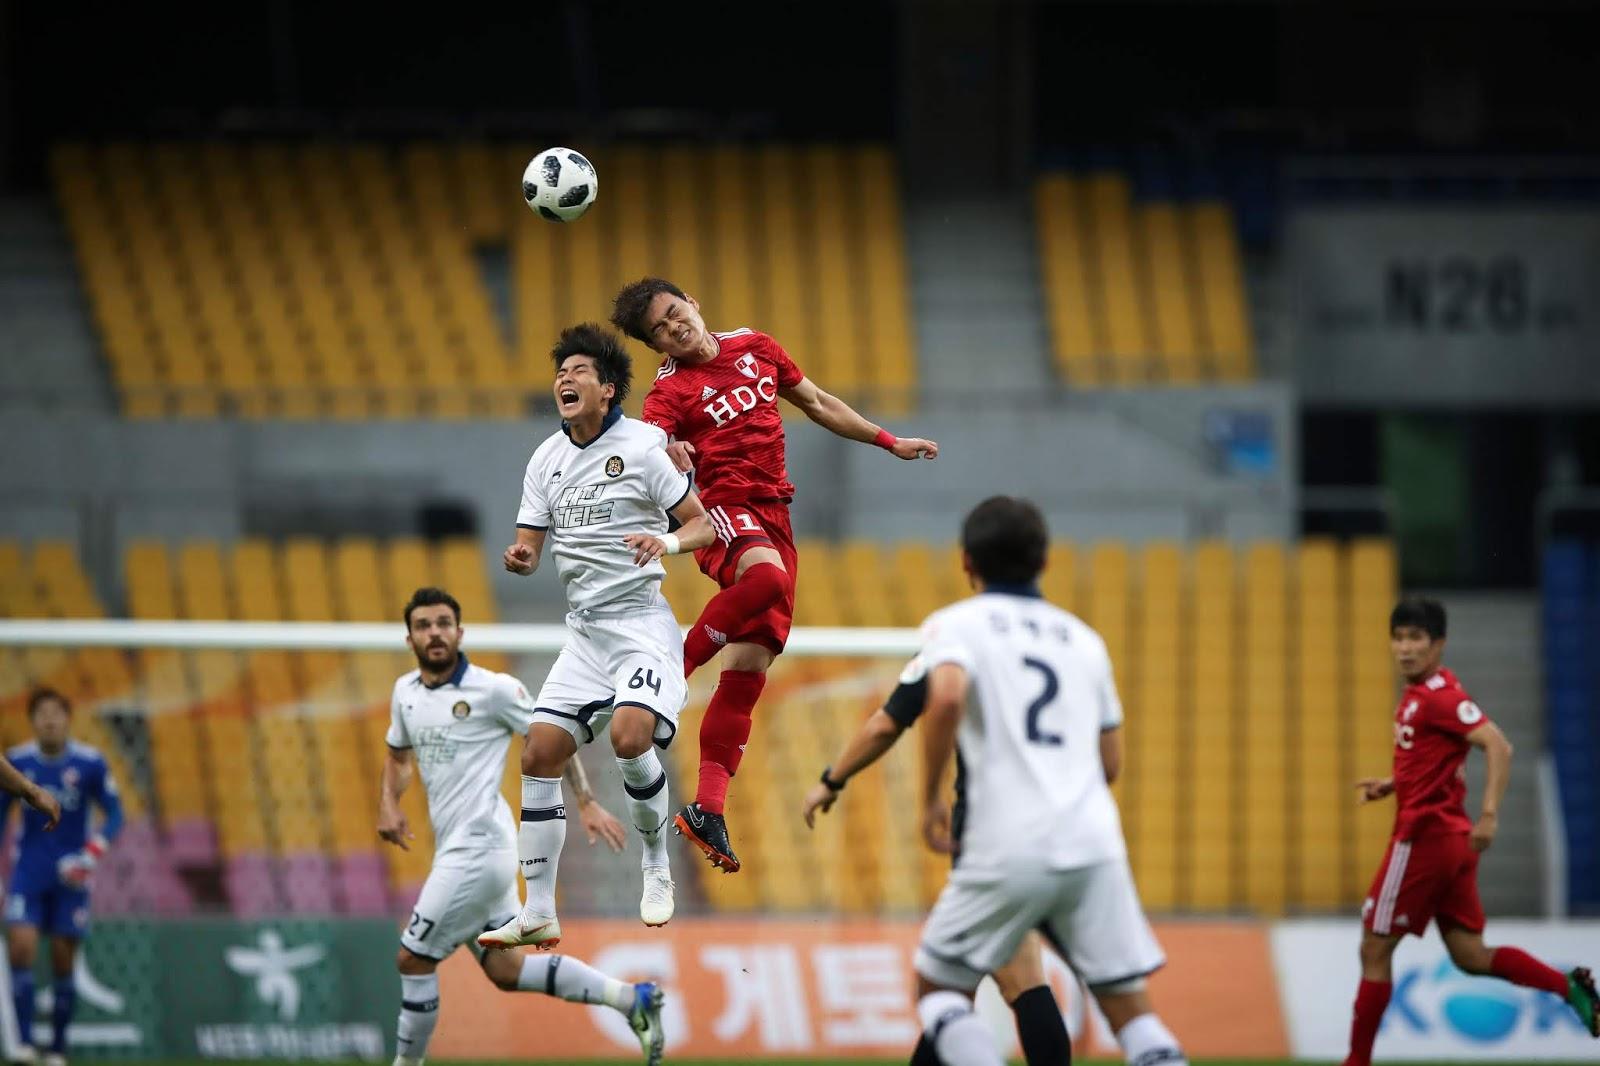 Preview: Busan IPark vs Gwangju FC K League 2 Kim Myung-joon